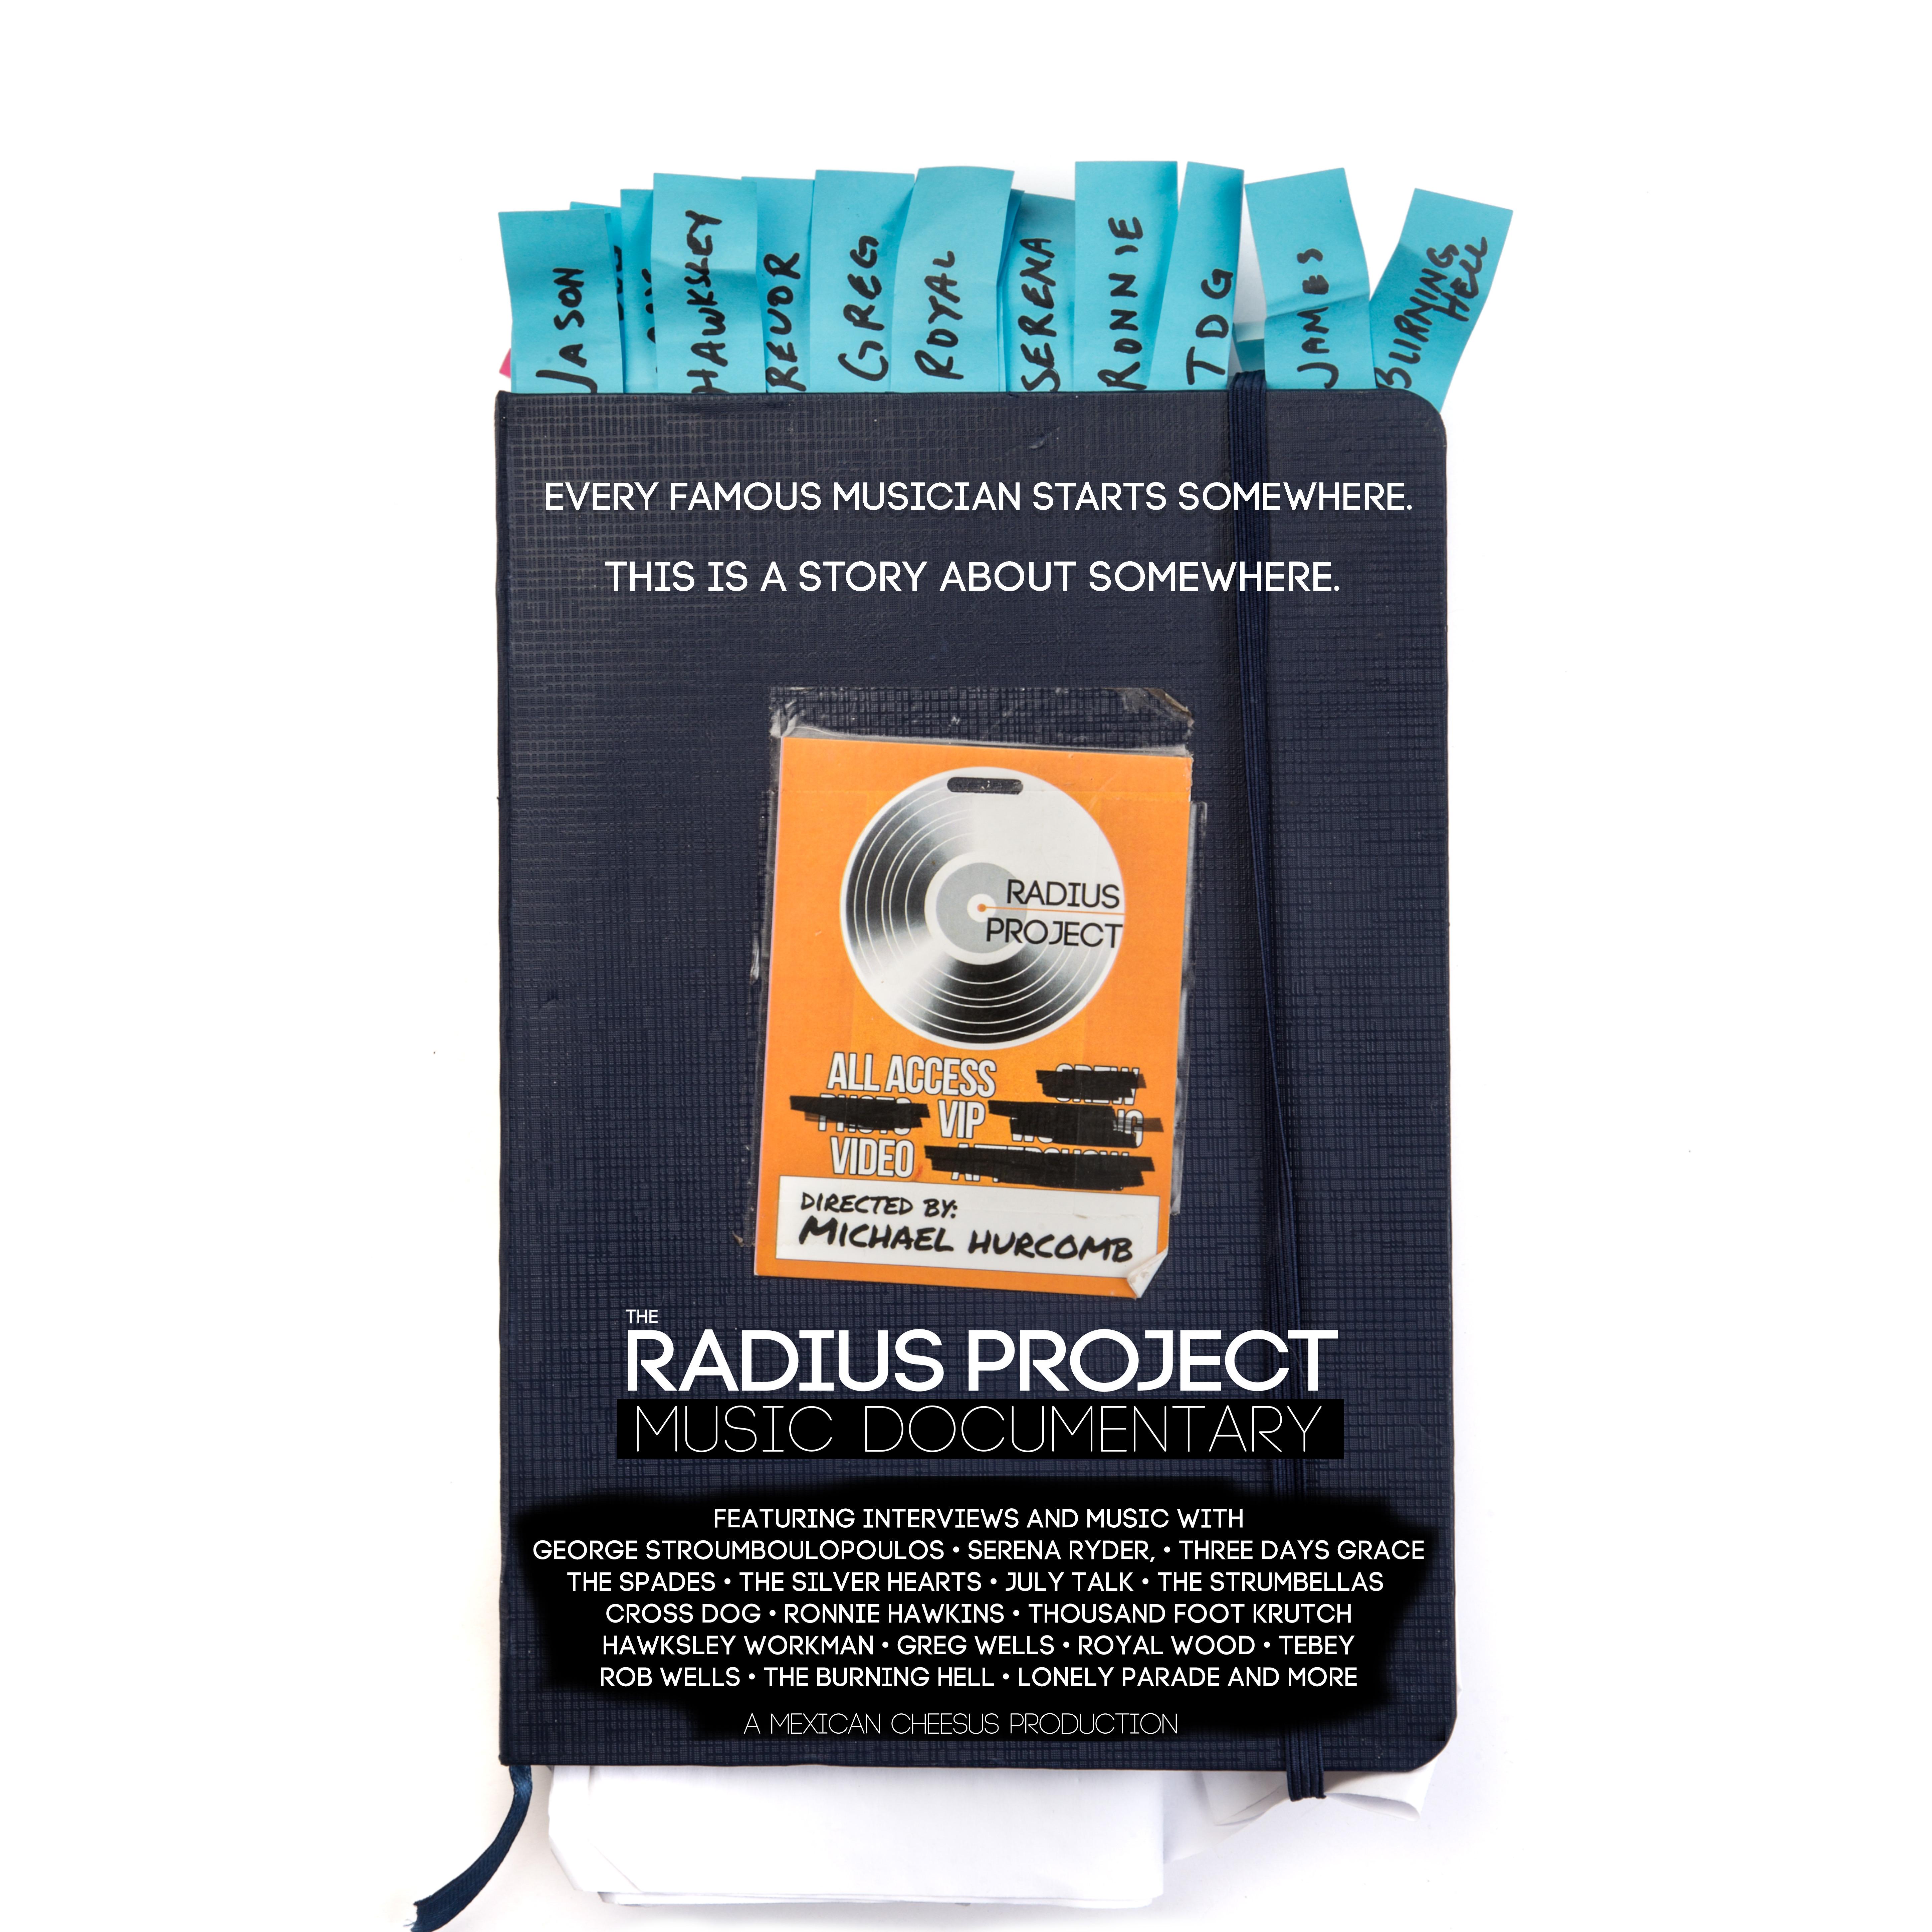 The Radius Project 2018 Imdb